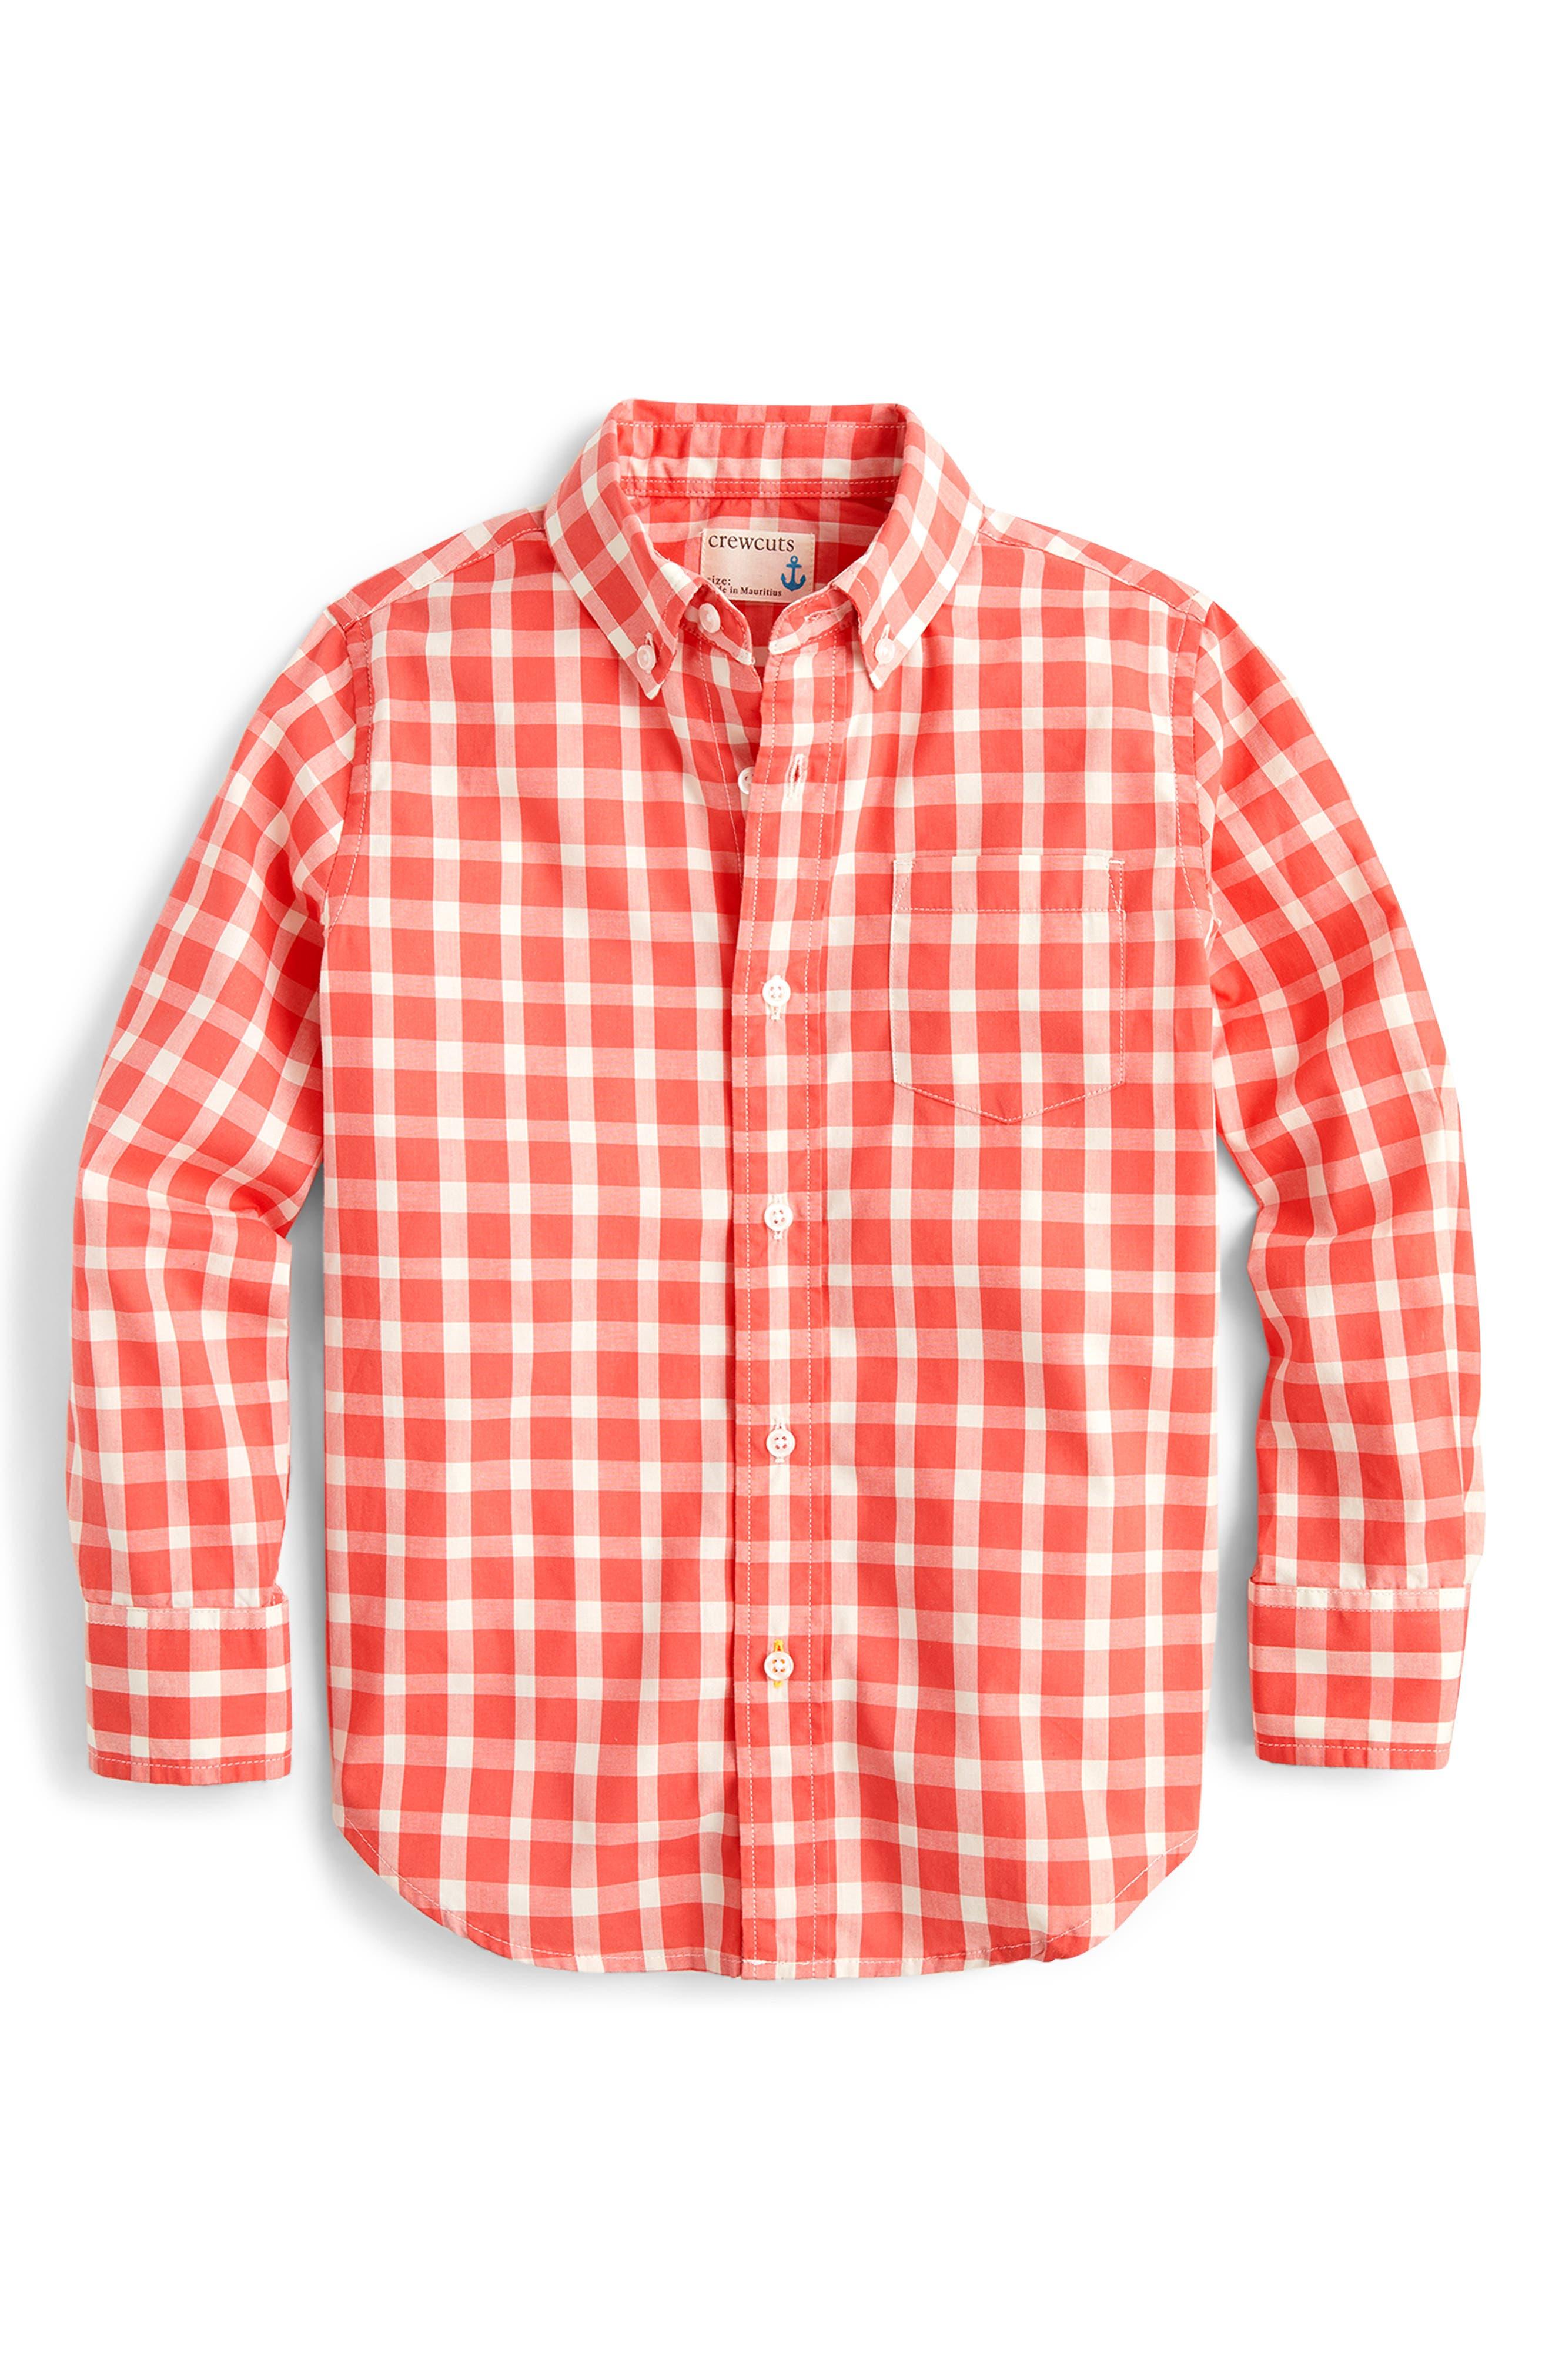 Boys Crewcuts By Jcrew Gingham Stretch Poplin ButtonDown Shirt Size 67  Red